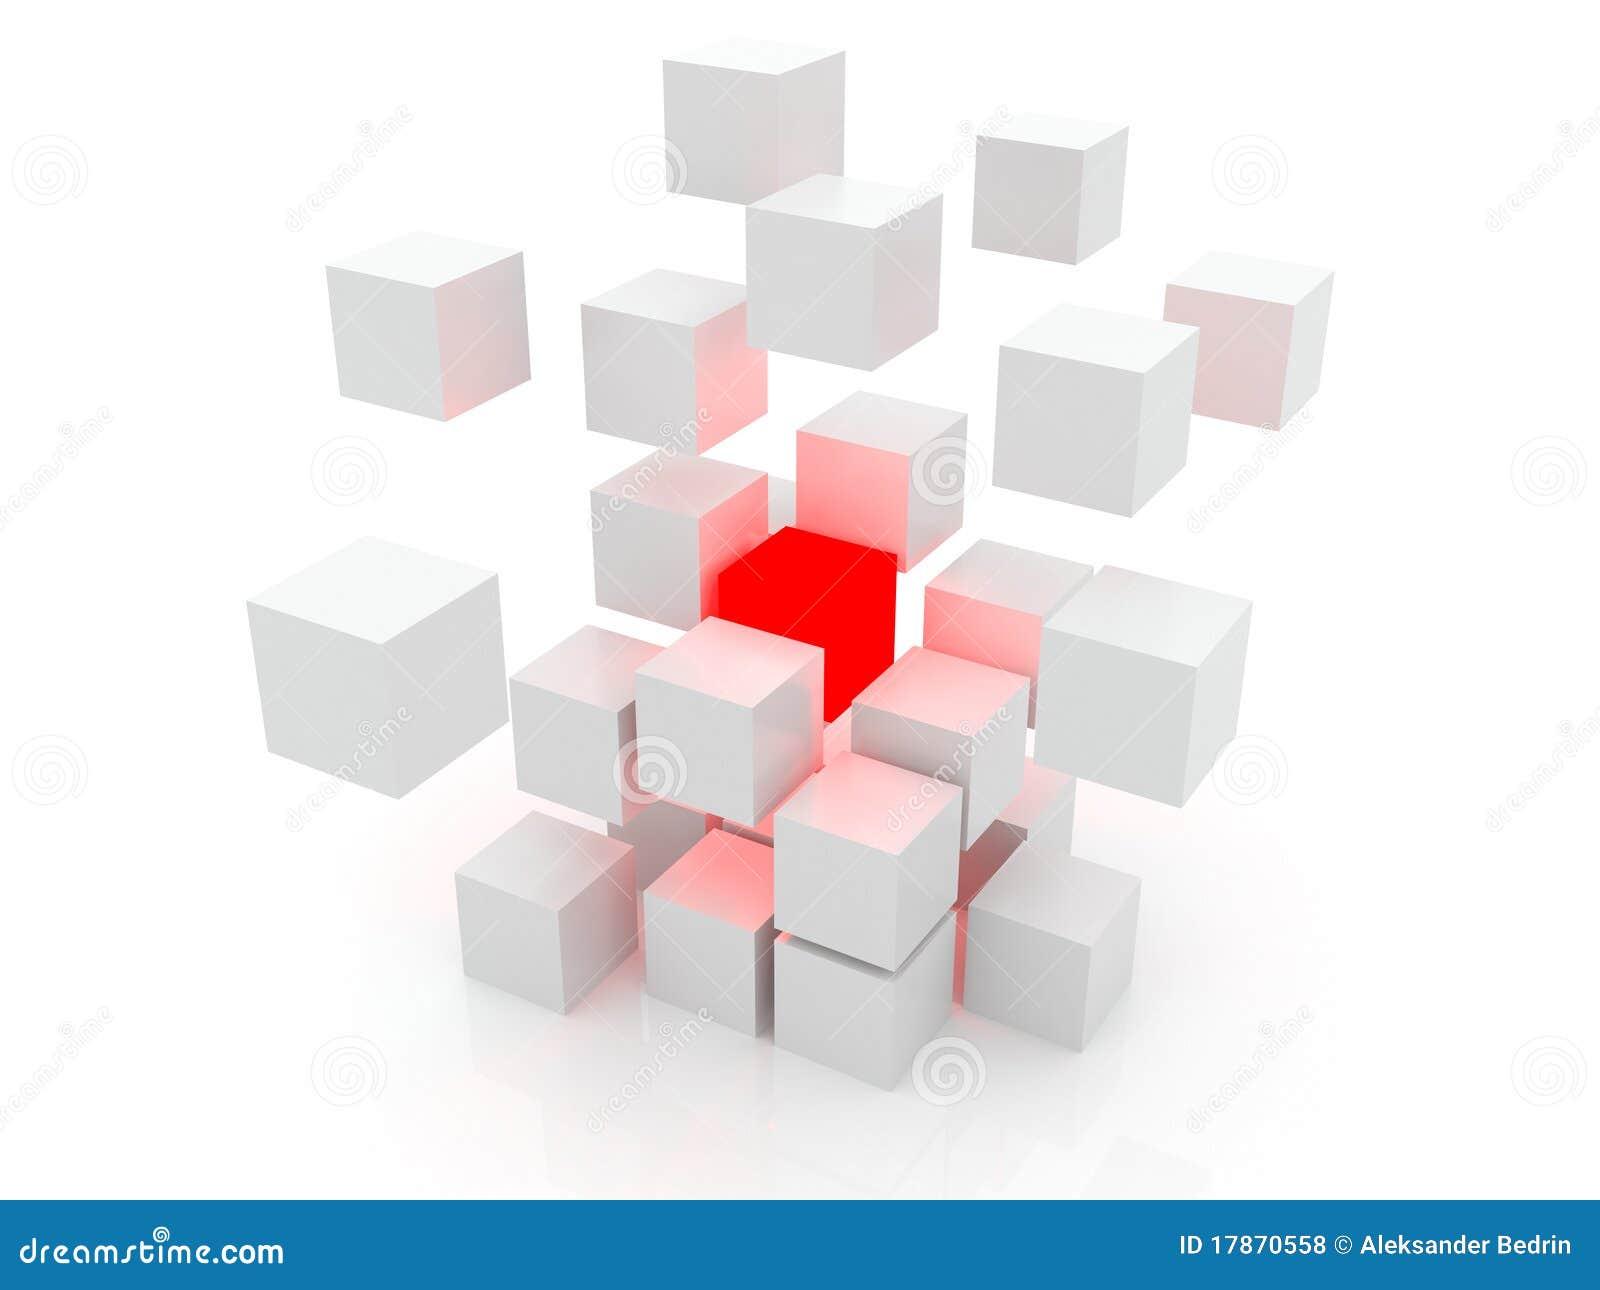 cube blanc 3d photos libres de droits image 17870558. Black Bedroom Furniture Sets. Home Design Ideas